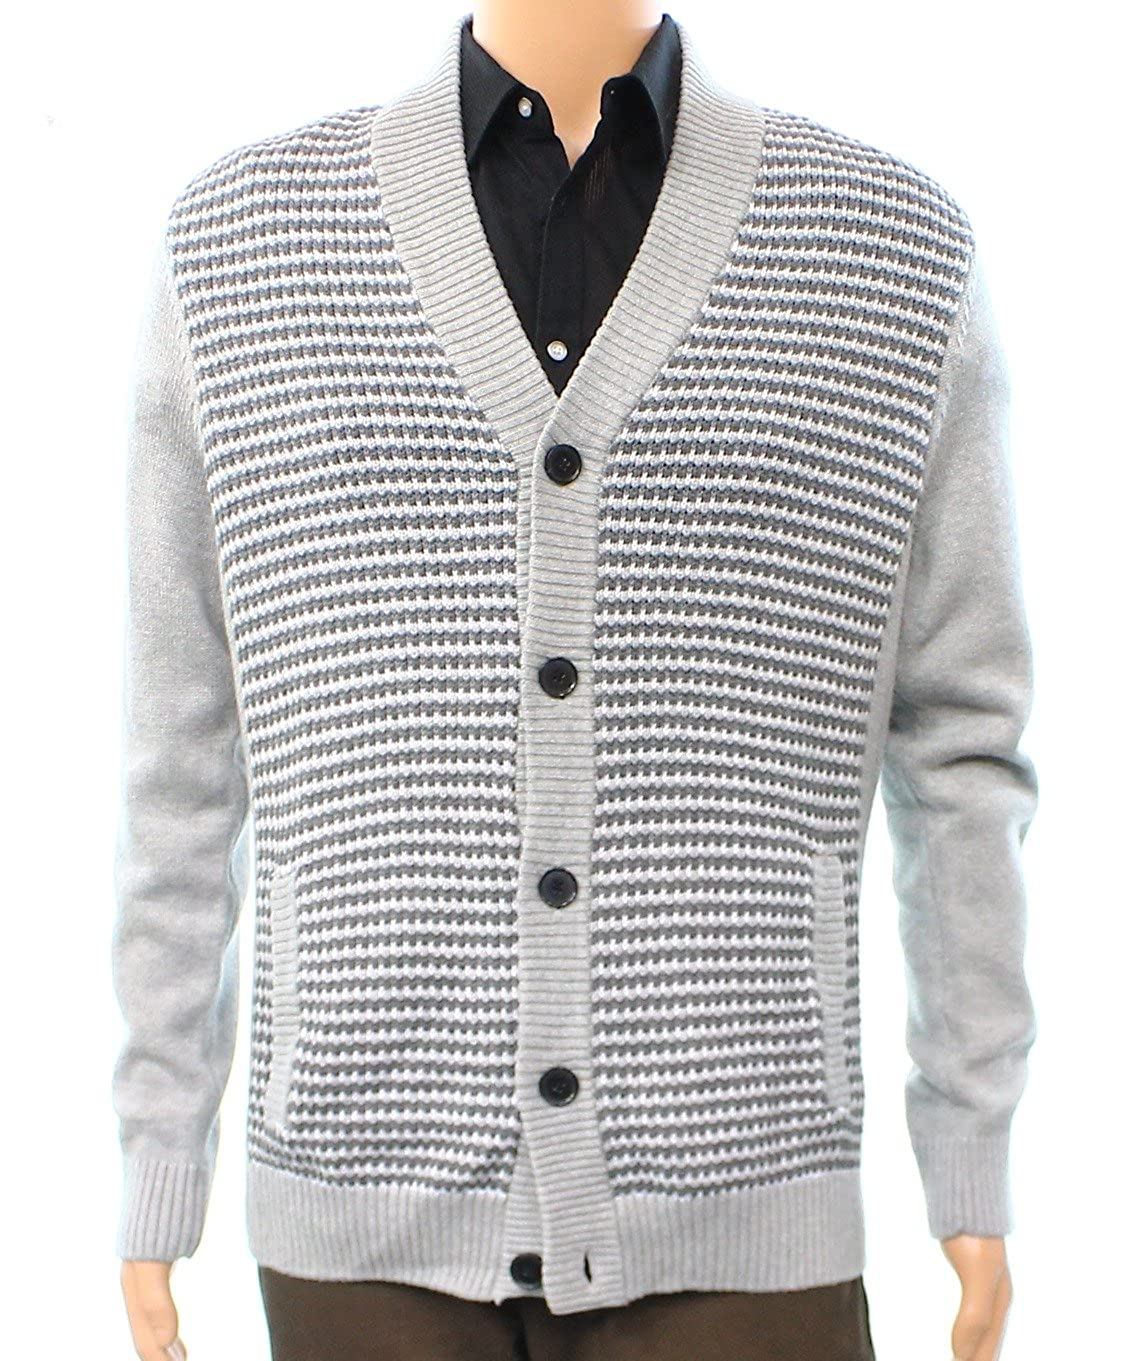 Alfani Mens Ribbed Knit Trim Colorblock Cardigan Sweater 14318CRD